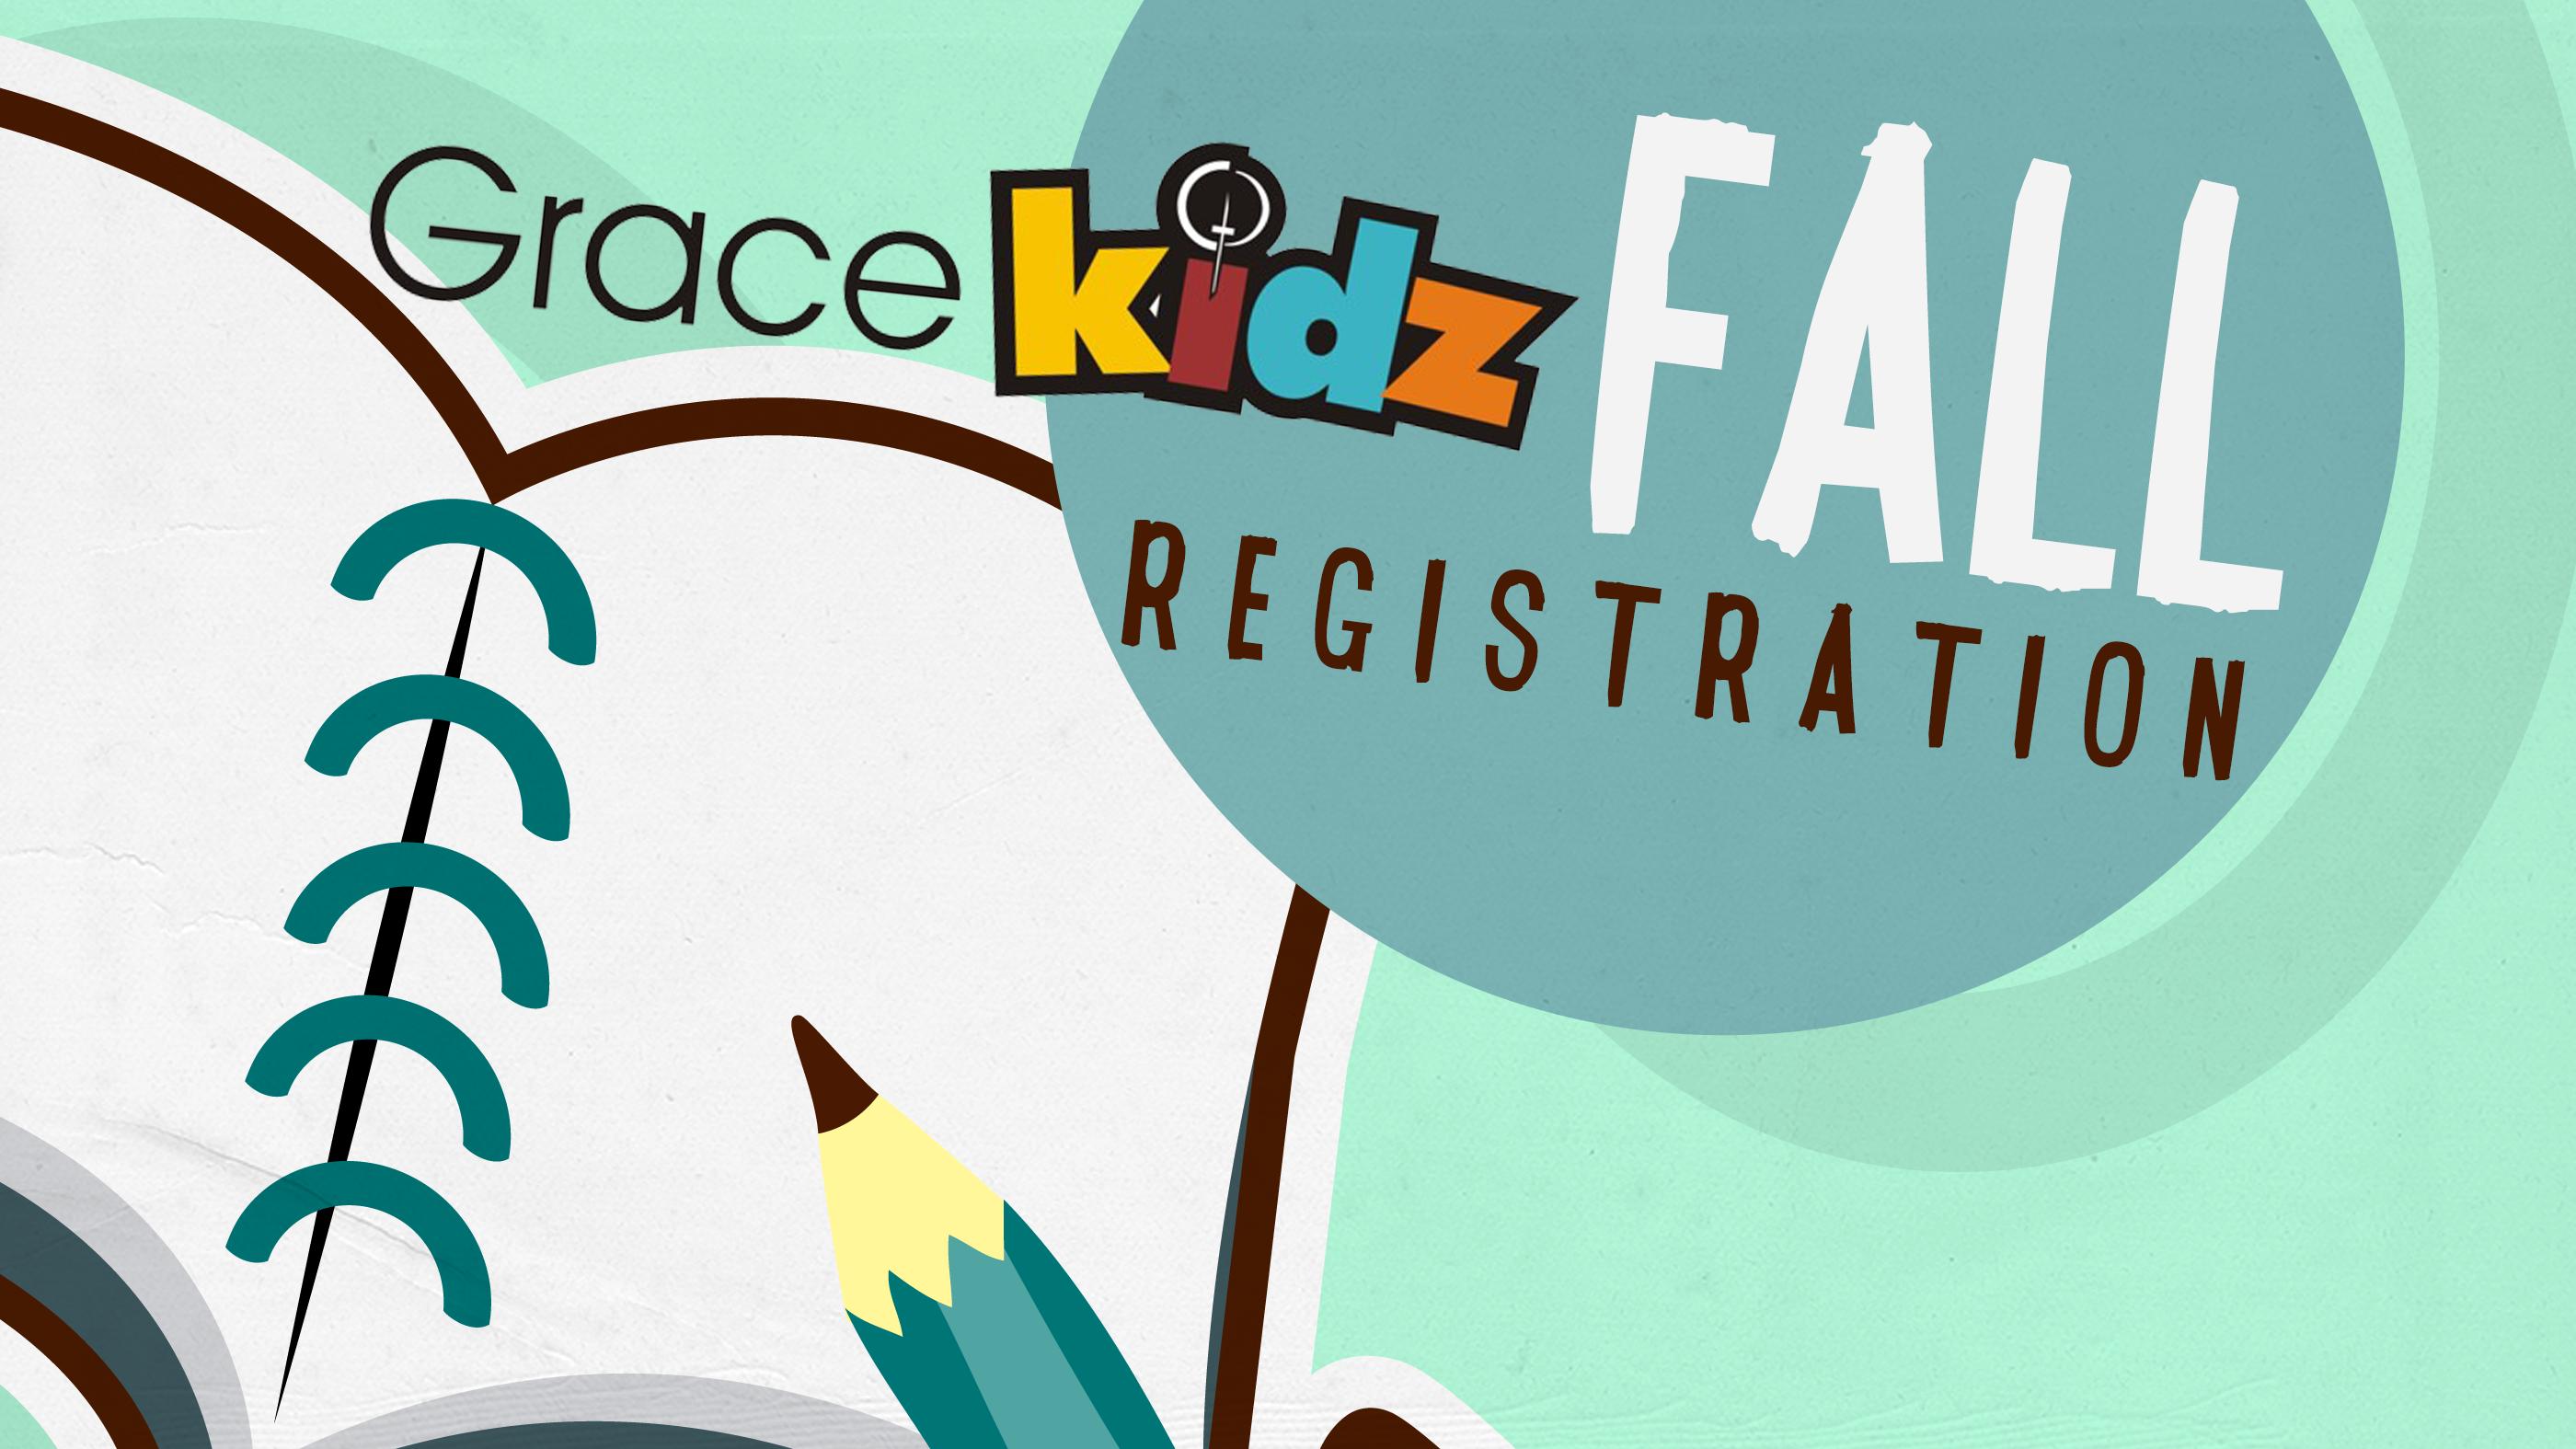 GraceKidz Registration